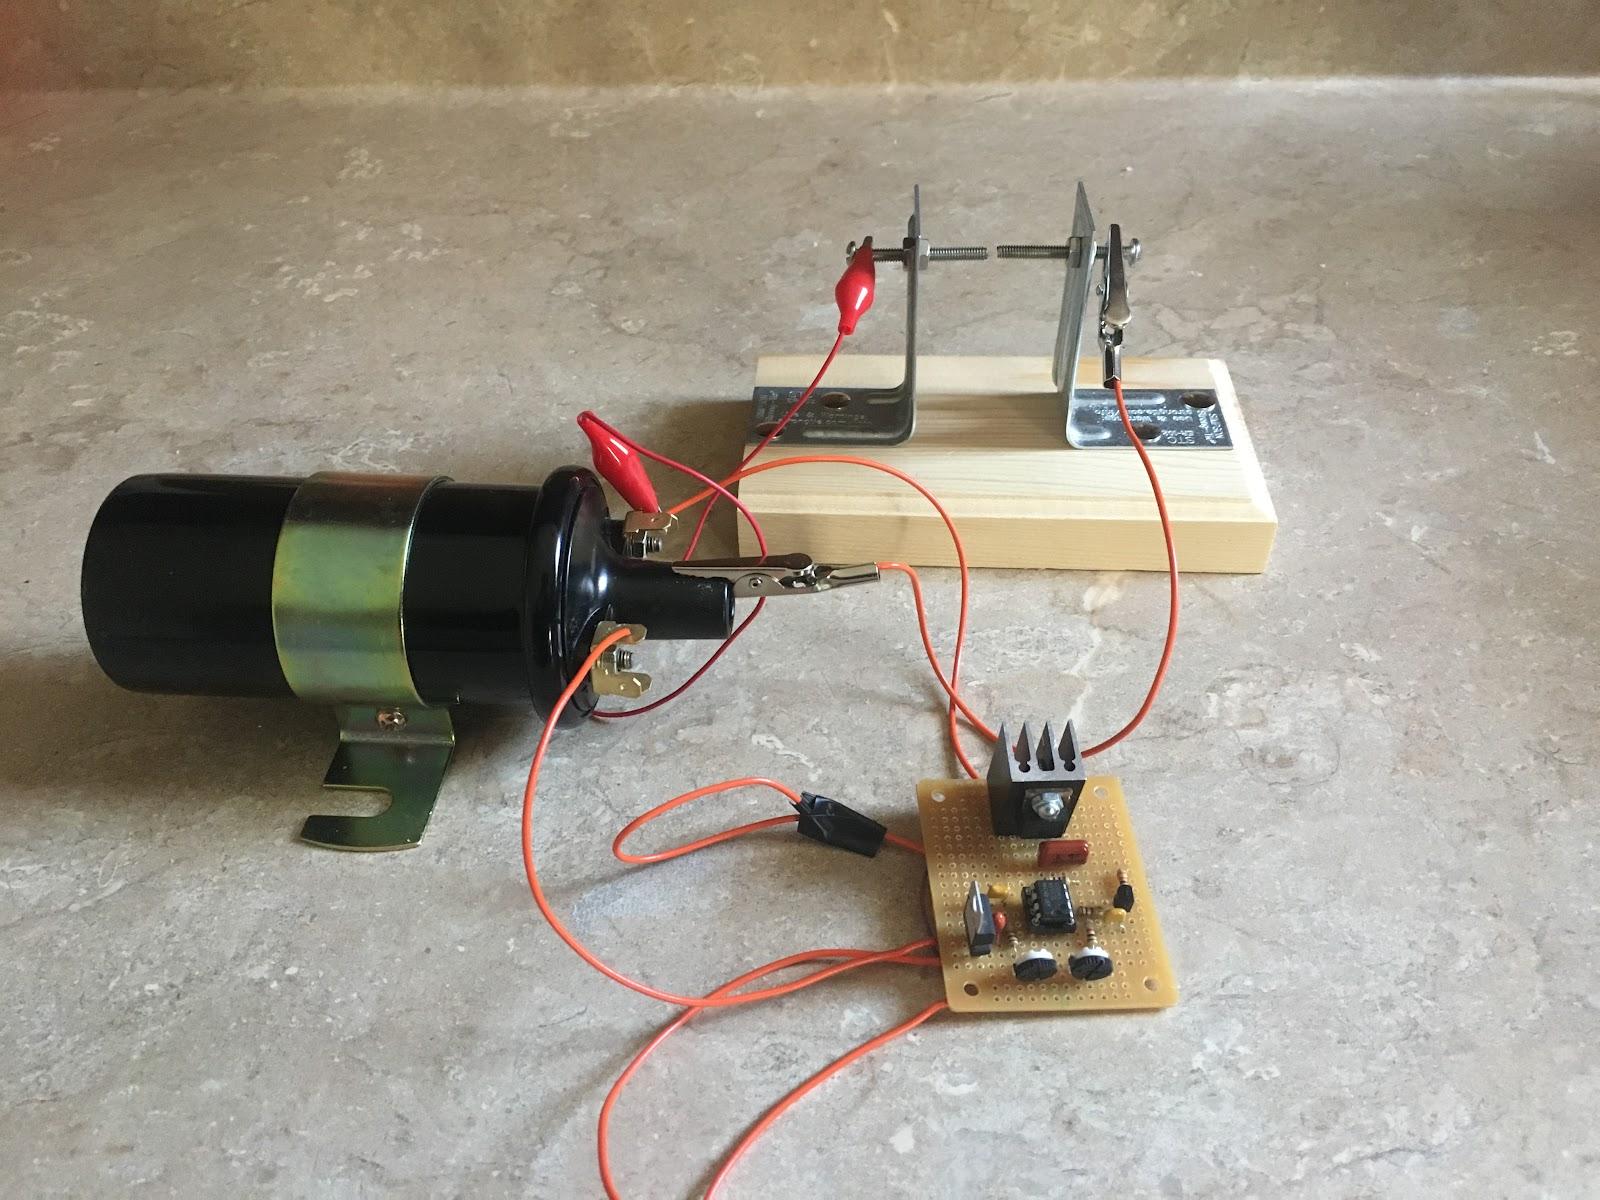 spark-system-1.JPG